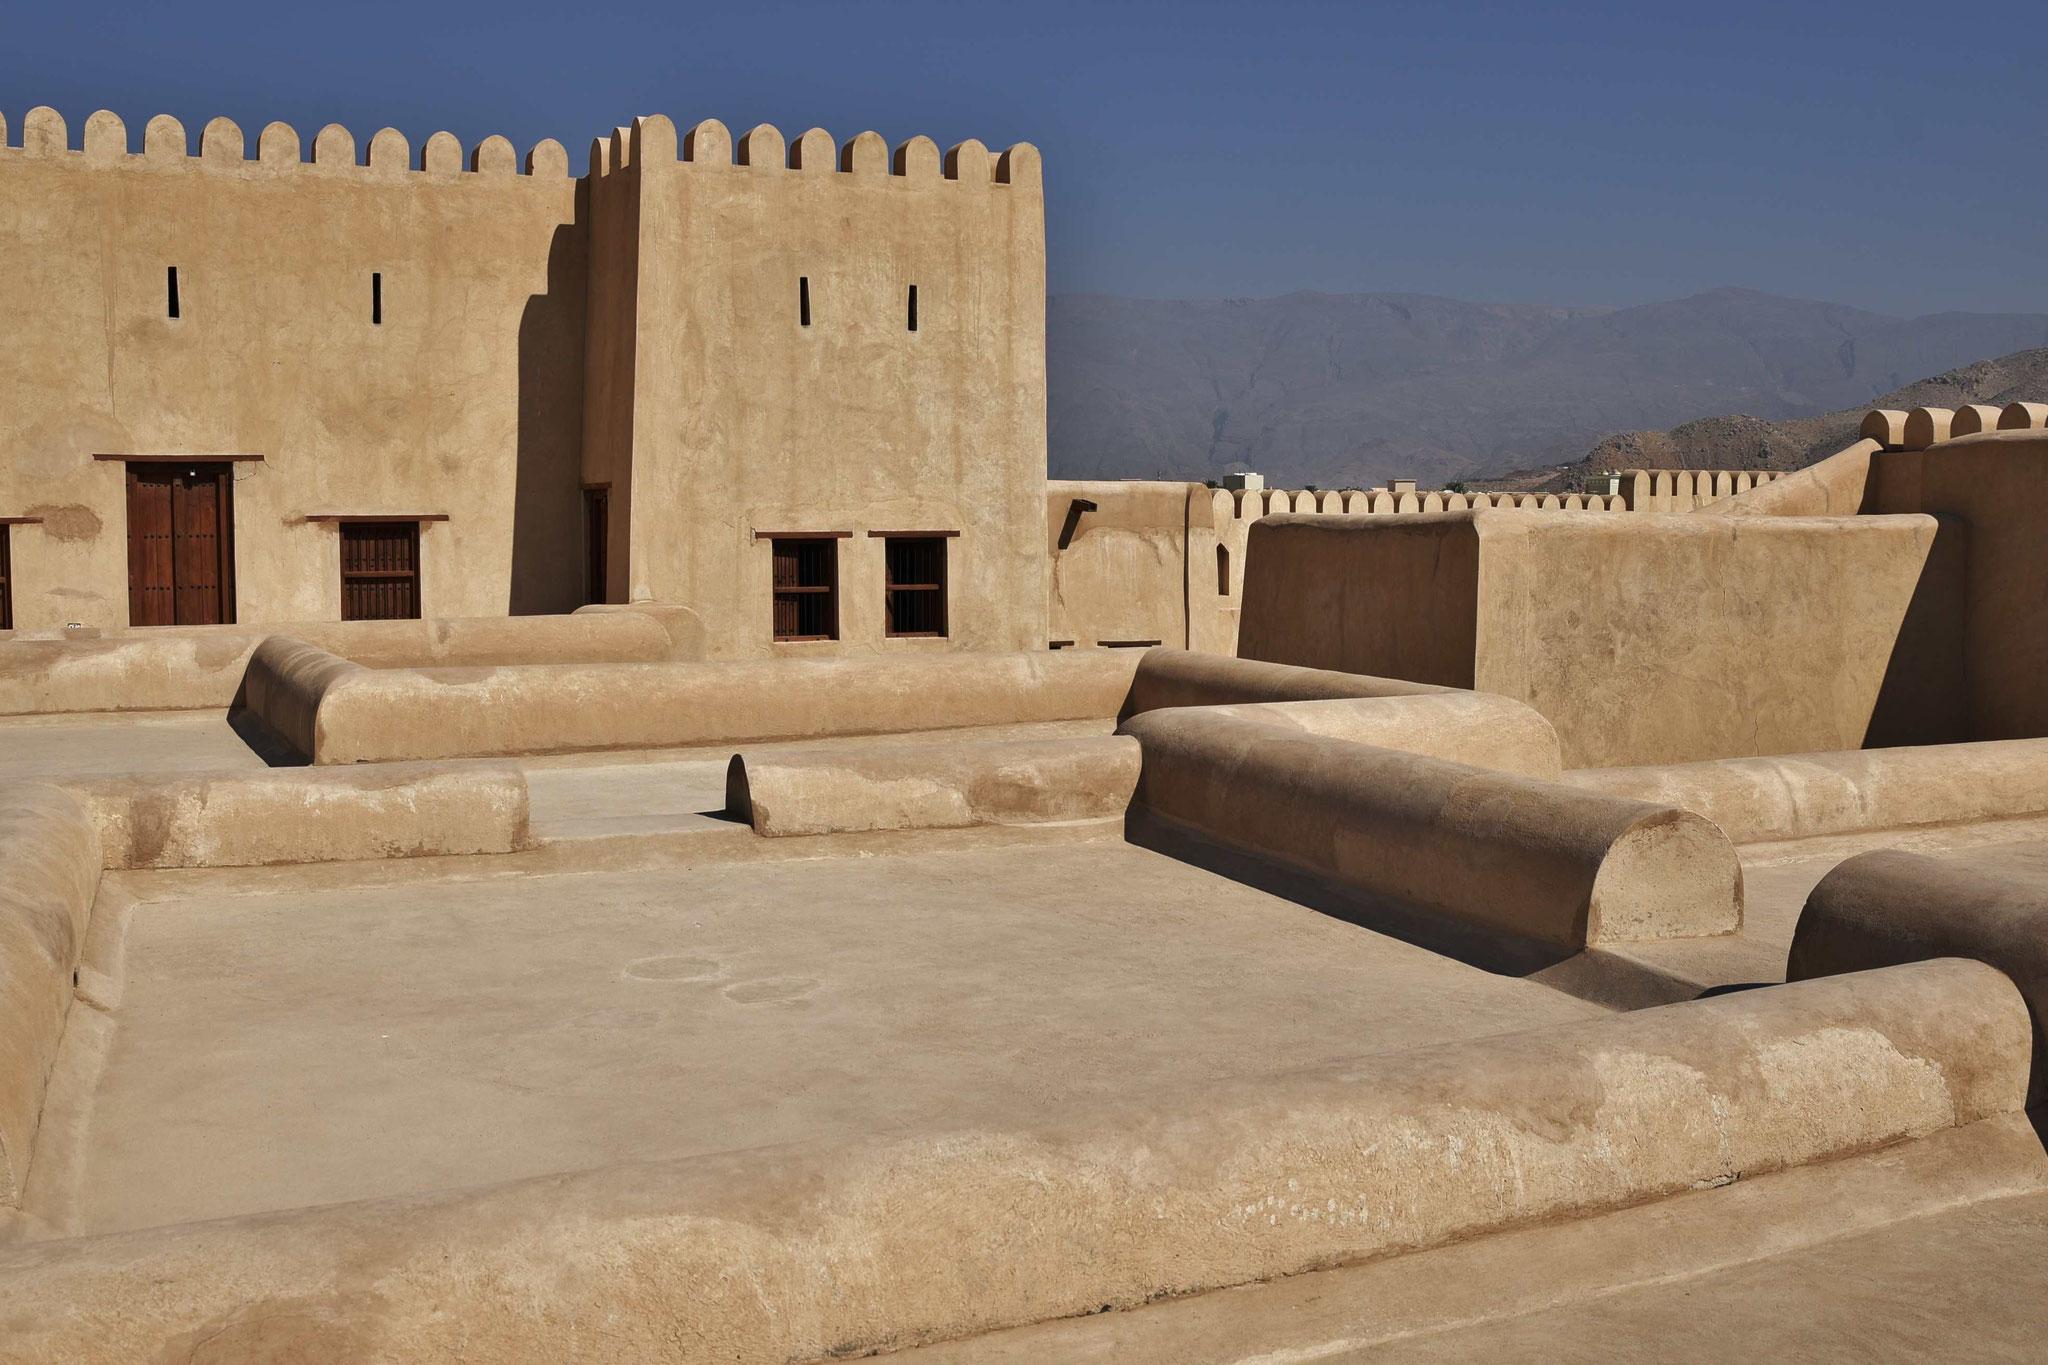 Auf dem Fort II